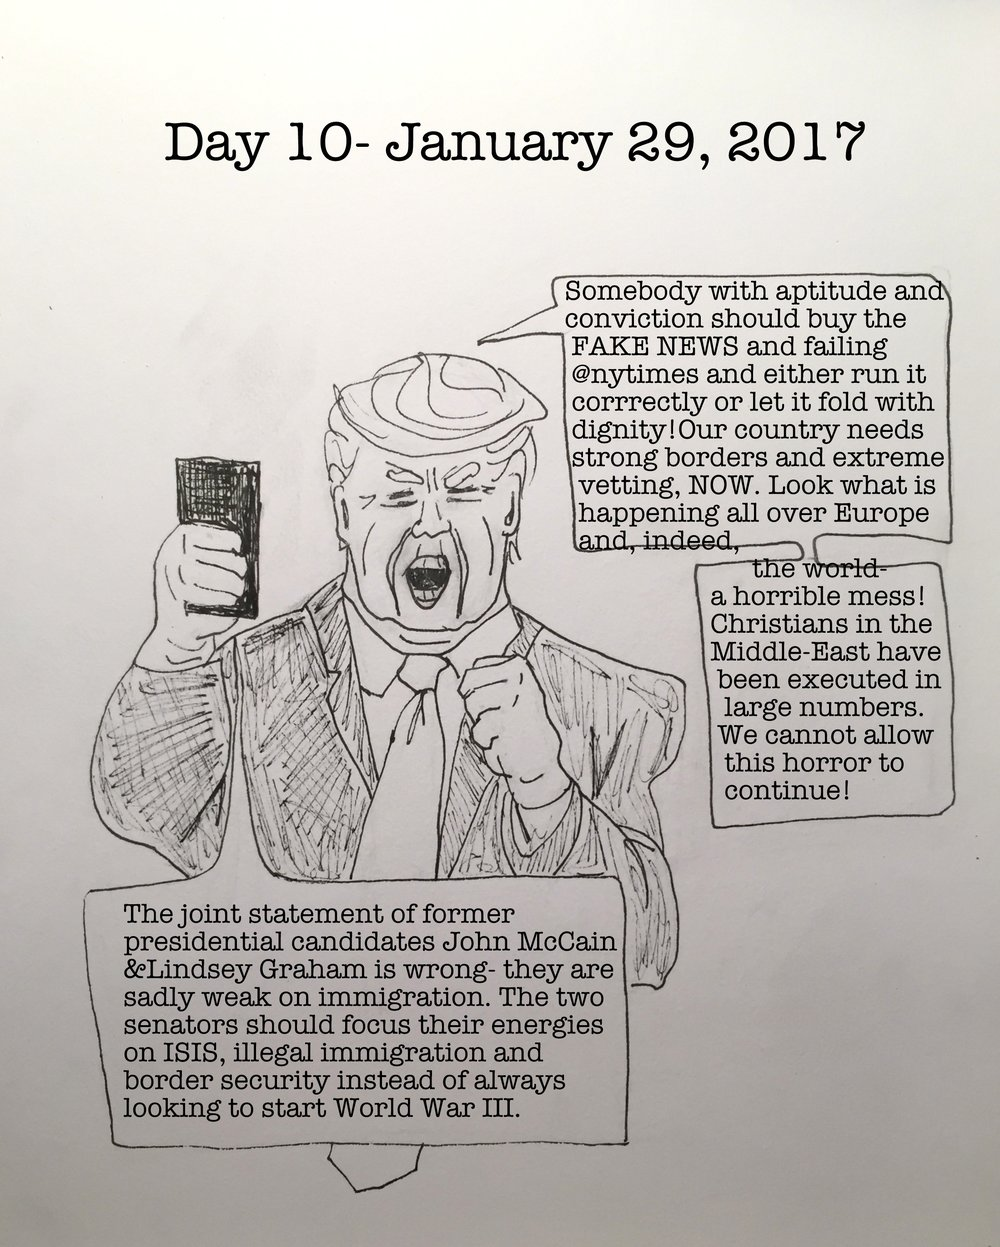 Day 10- January 29, 2017- Copyright 2017